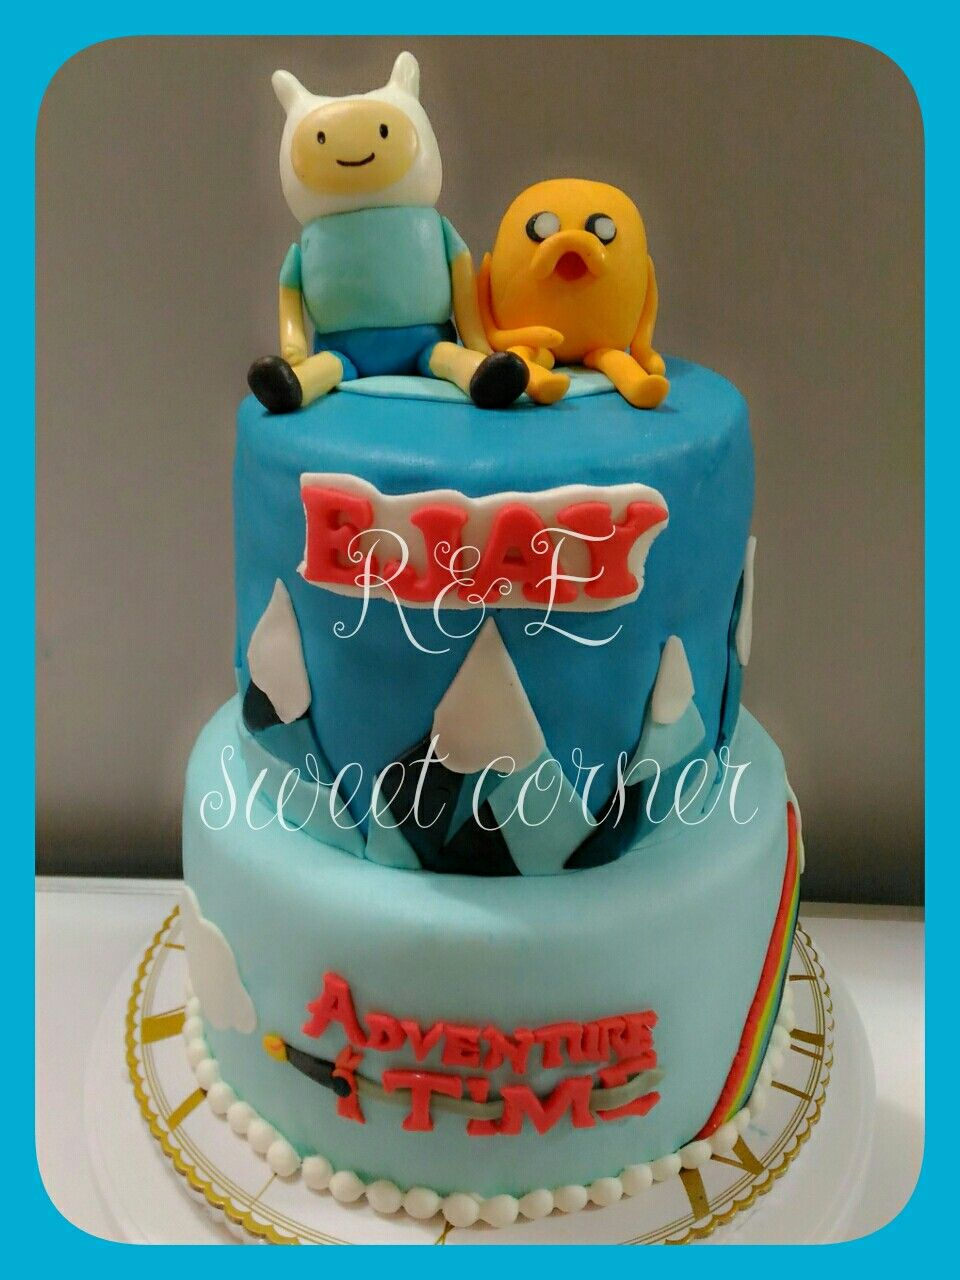 Adventure Time Birthday Cake R E Sweet Corner S Cakes Pinterest